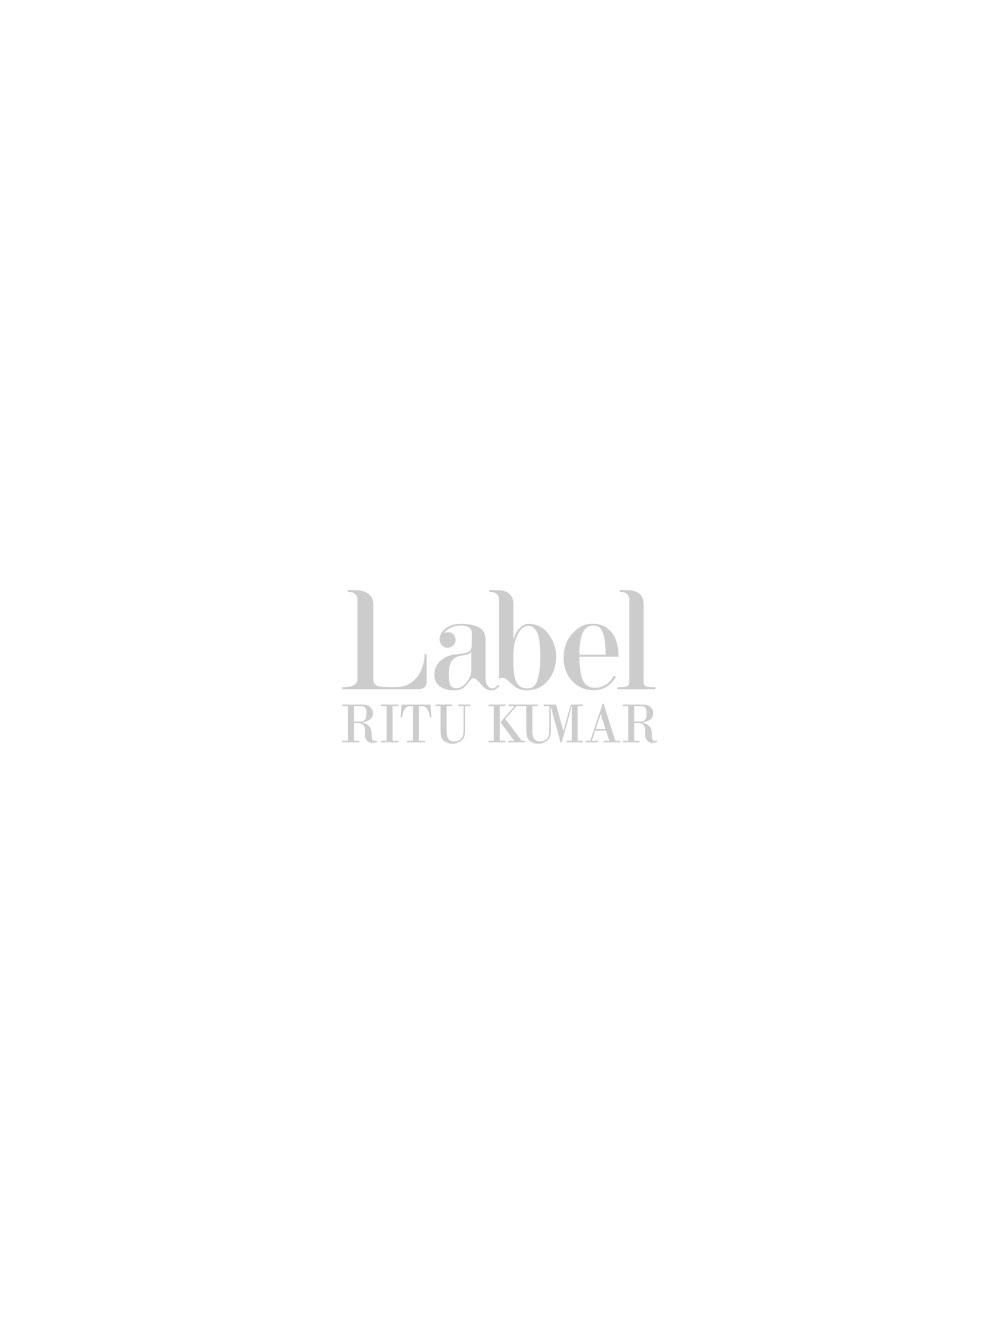 Blue Chambray Jumpsuit By Label Ritu Kumar